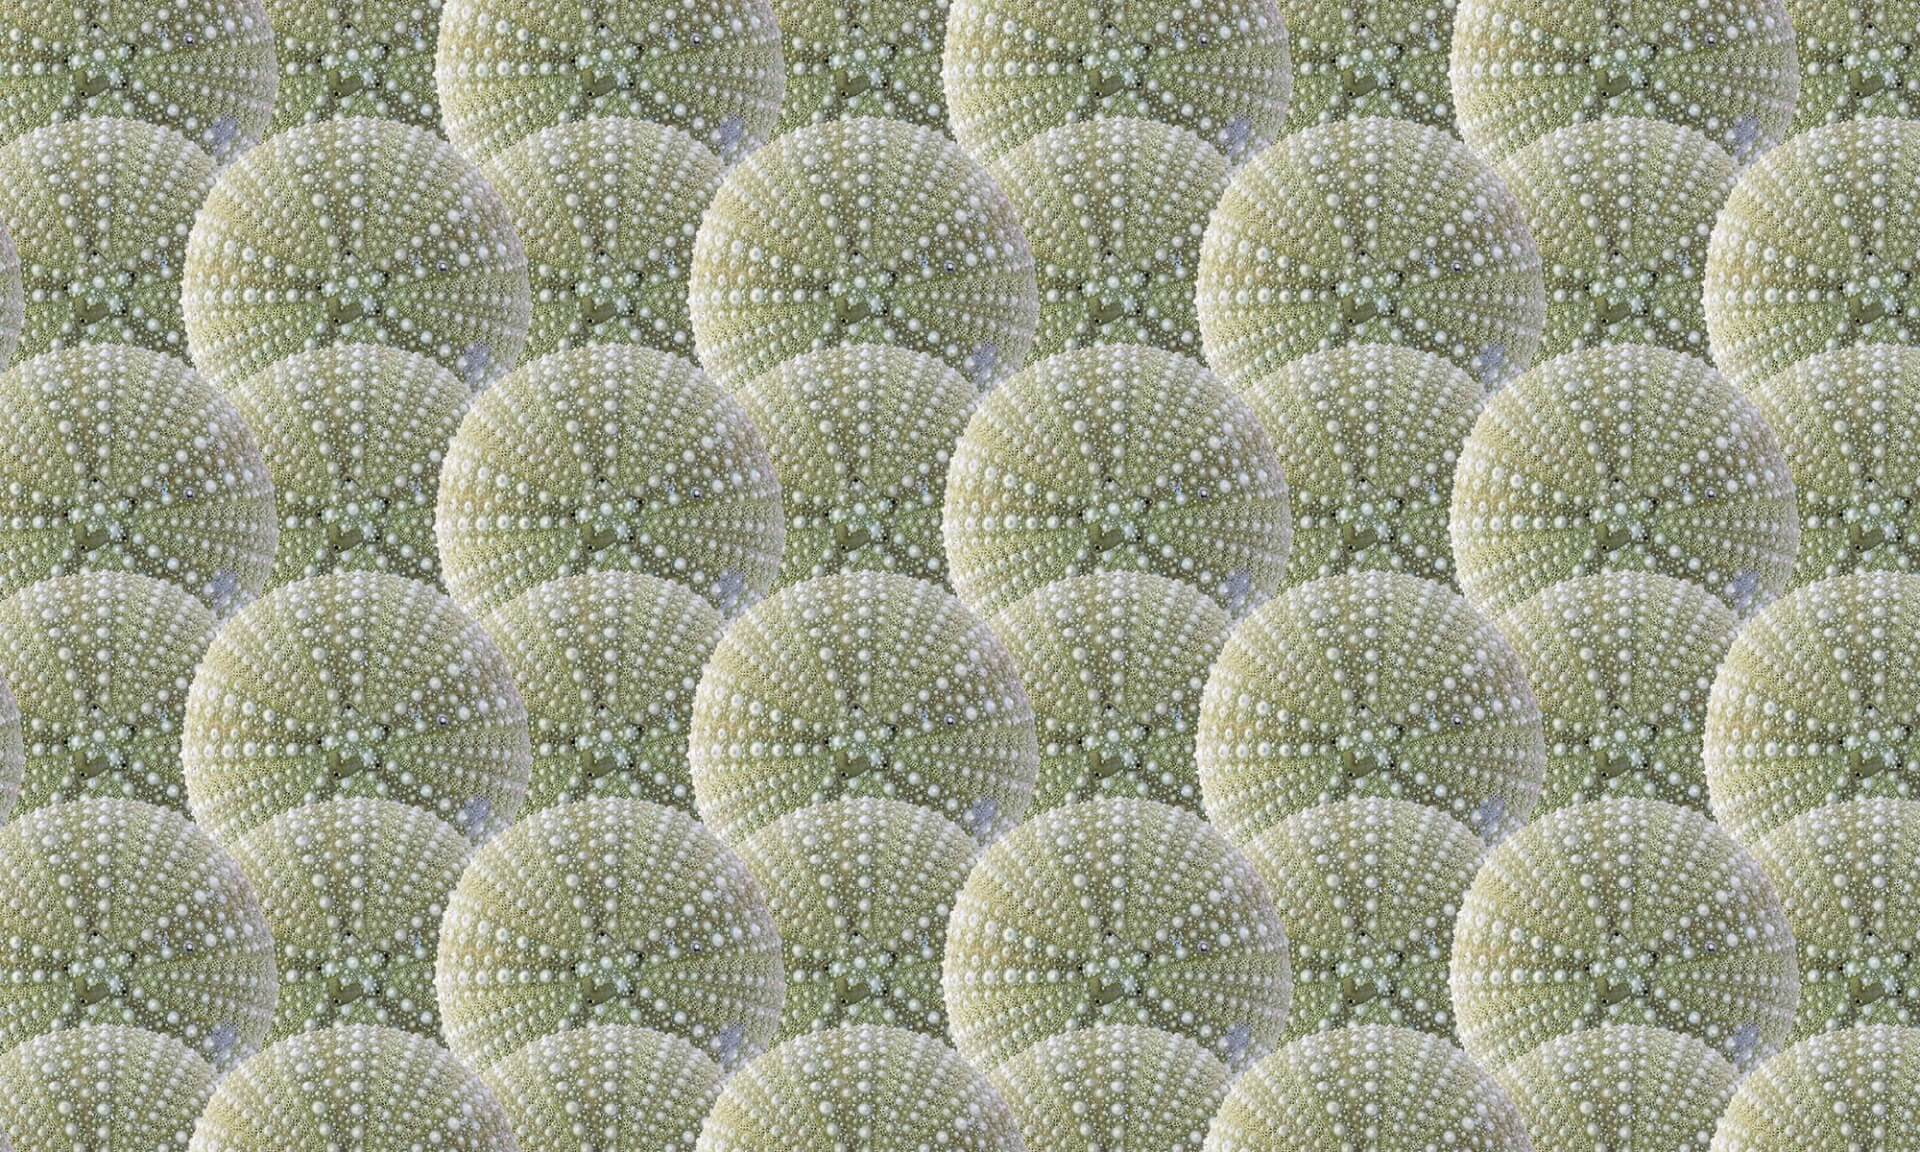 Sea Urchin-4 inch scallop Doug Garrabrants